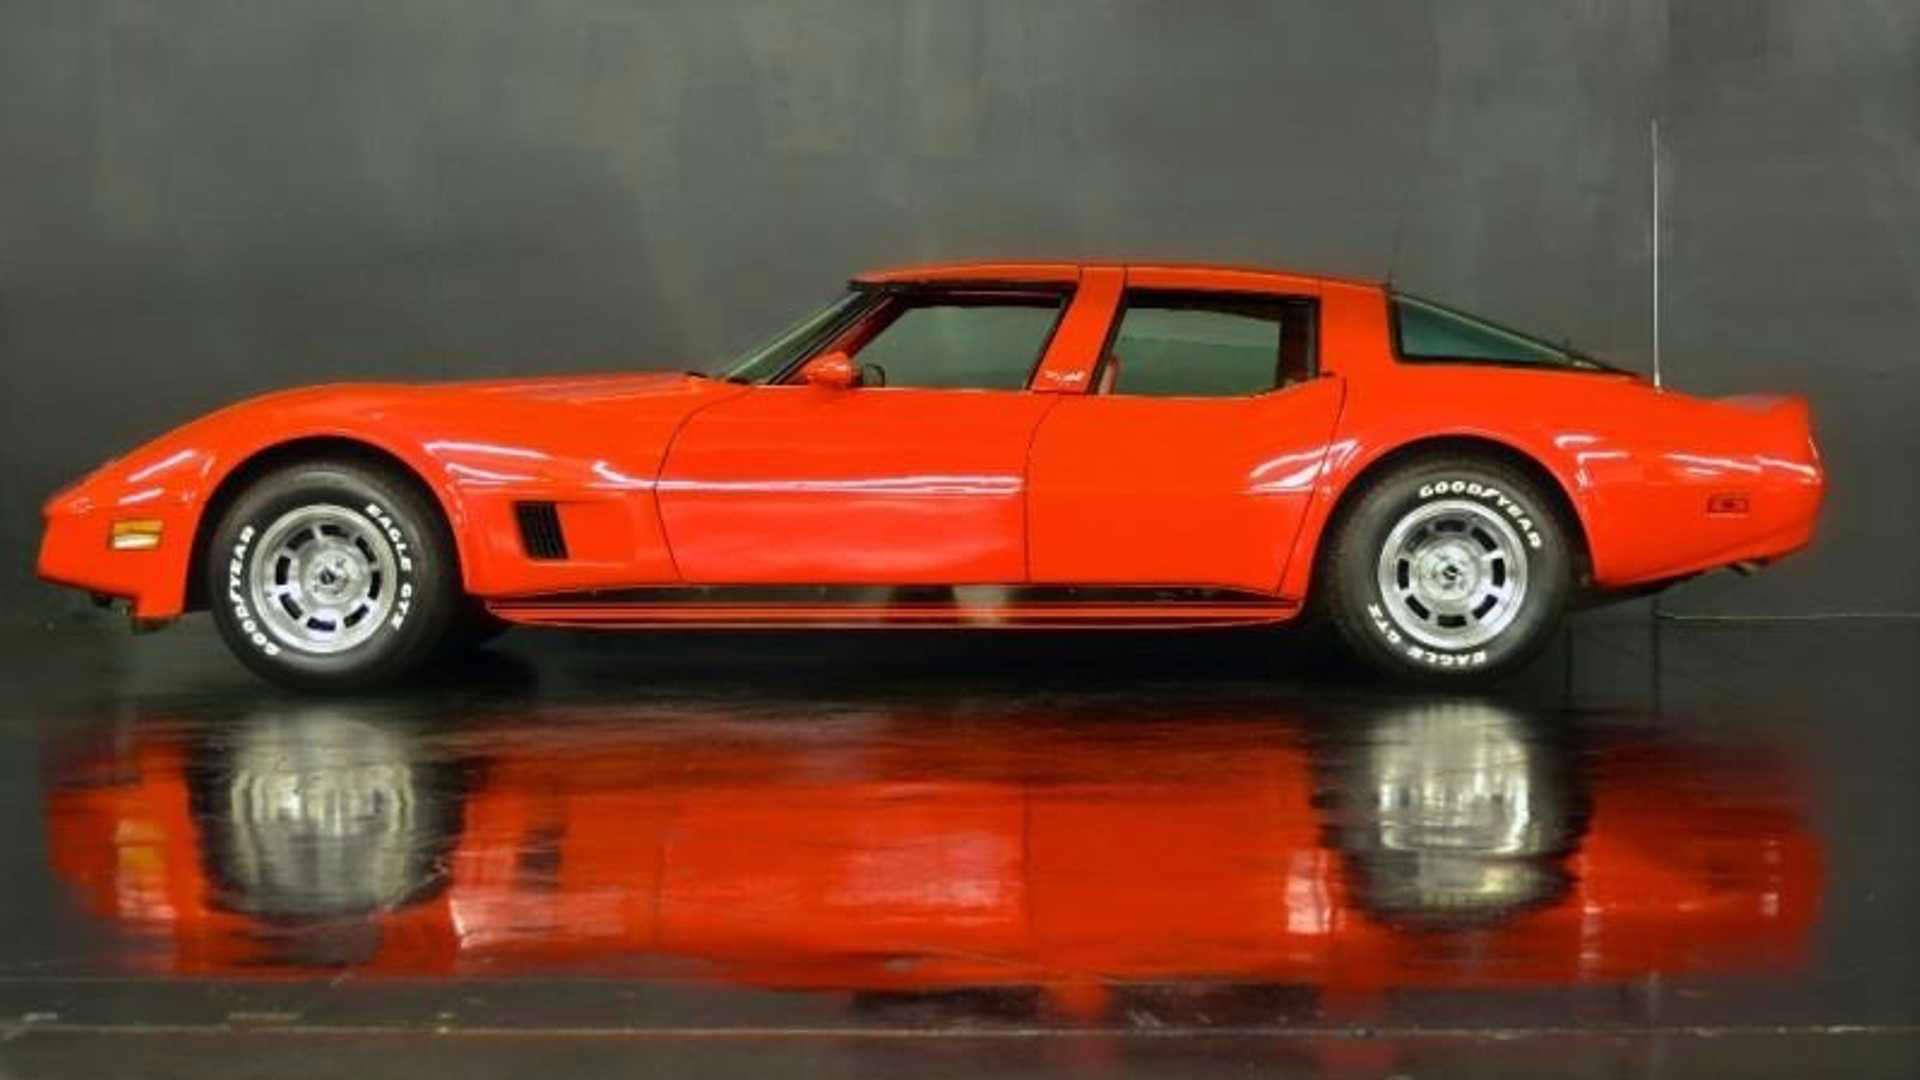 1980 Chevy Corvette Four Door Cant Be Unseen Seeks 217k